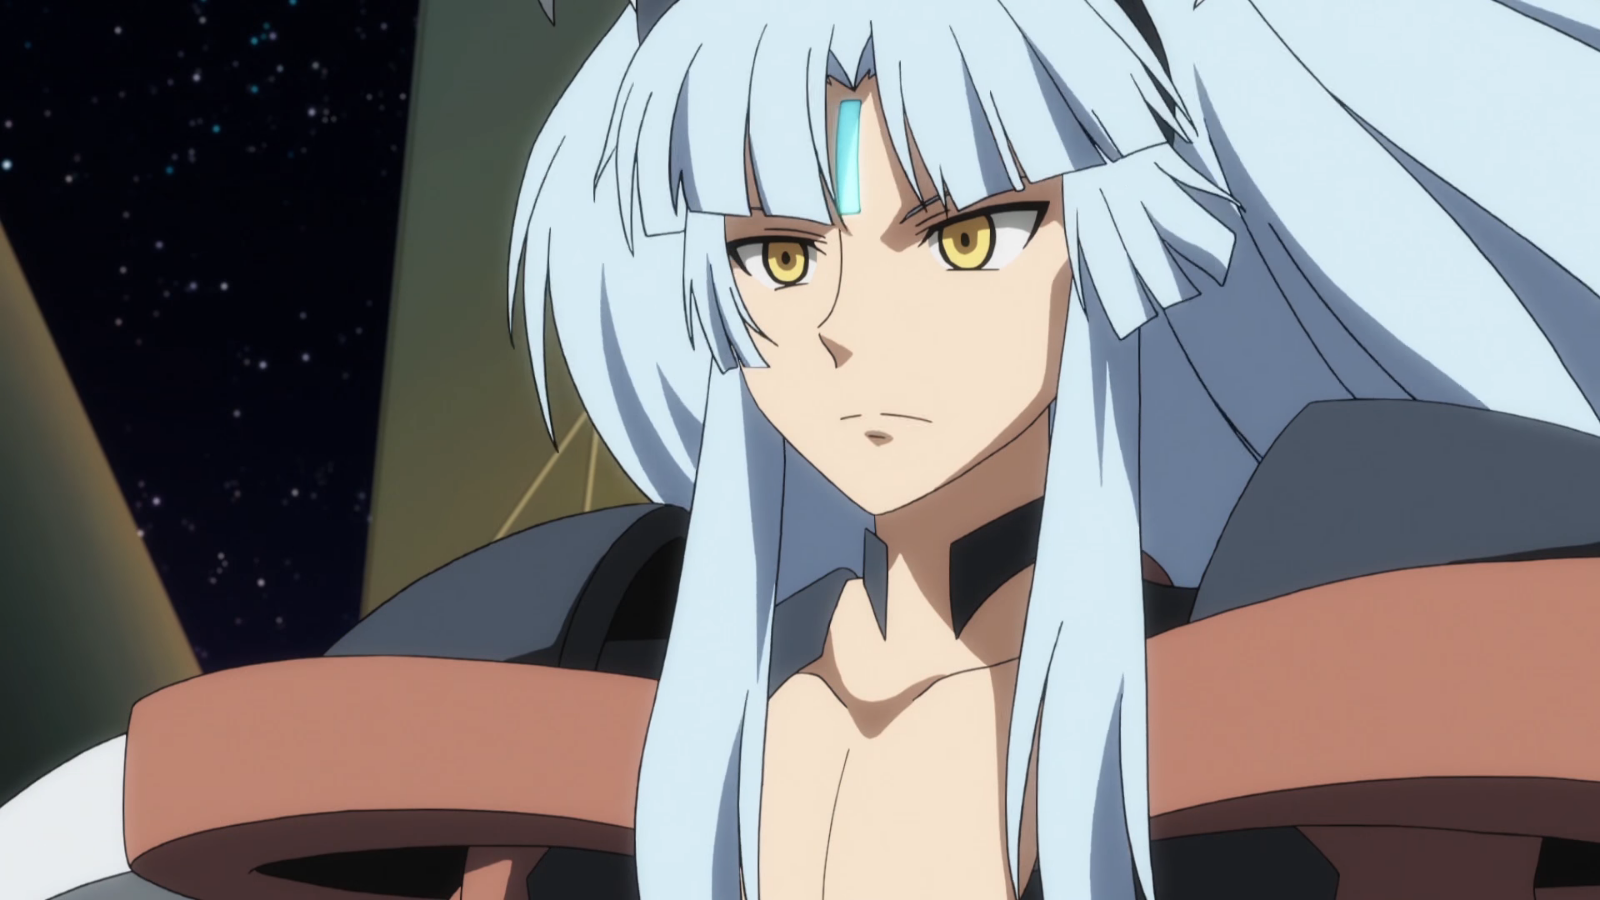 Ezel (Character) | Cardfight!! Vanguard Wiki | FANDOM powered by Wikia